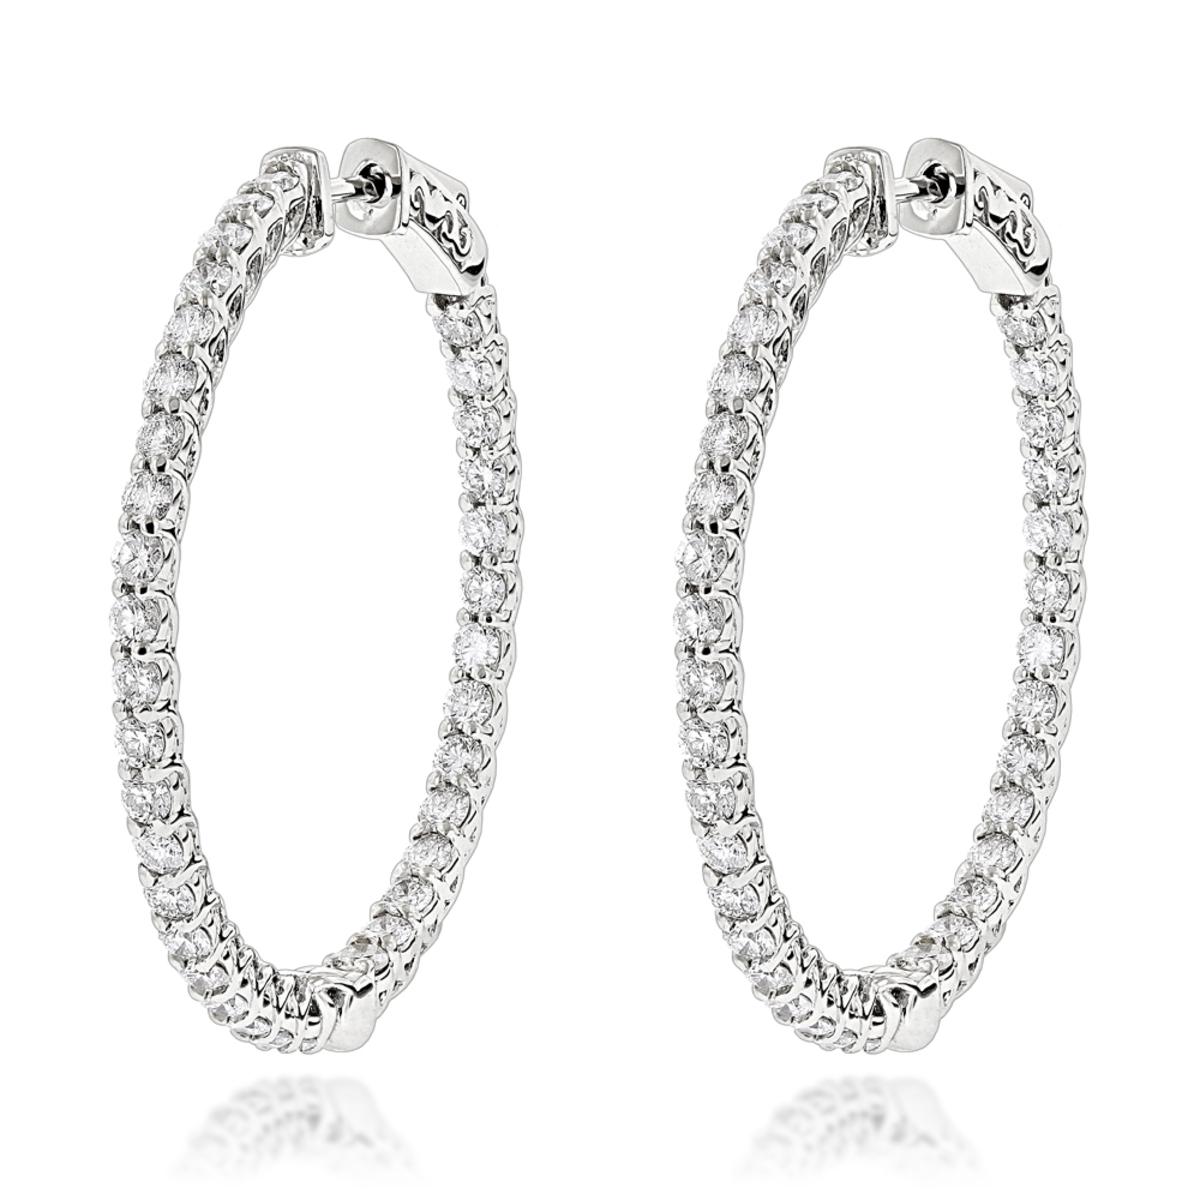 Diamond Hoops 14K Gold Diamond Hoop Earrings Inside Out 3.5ct